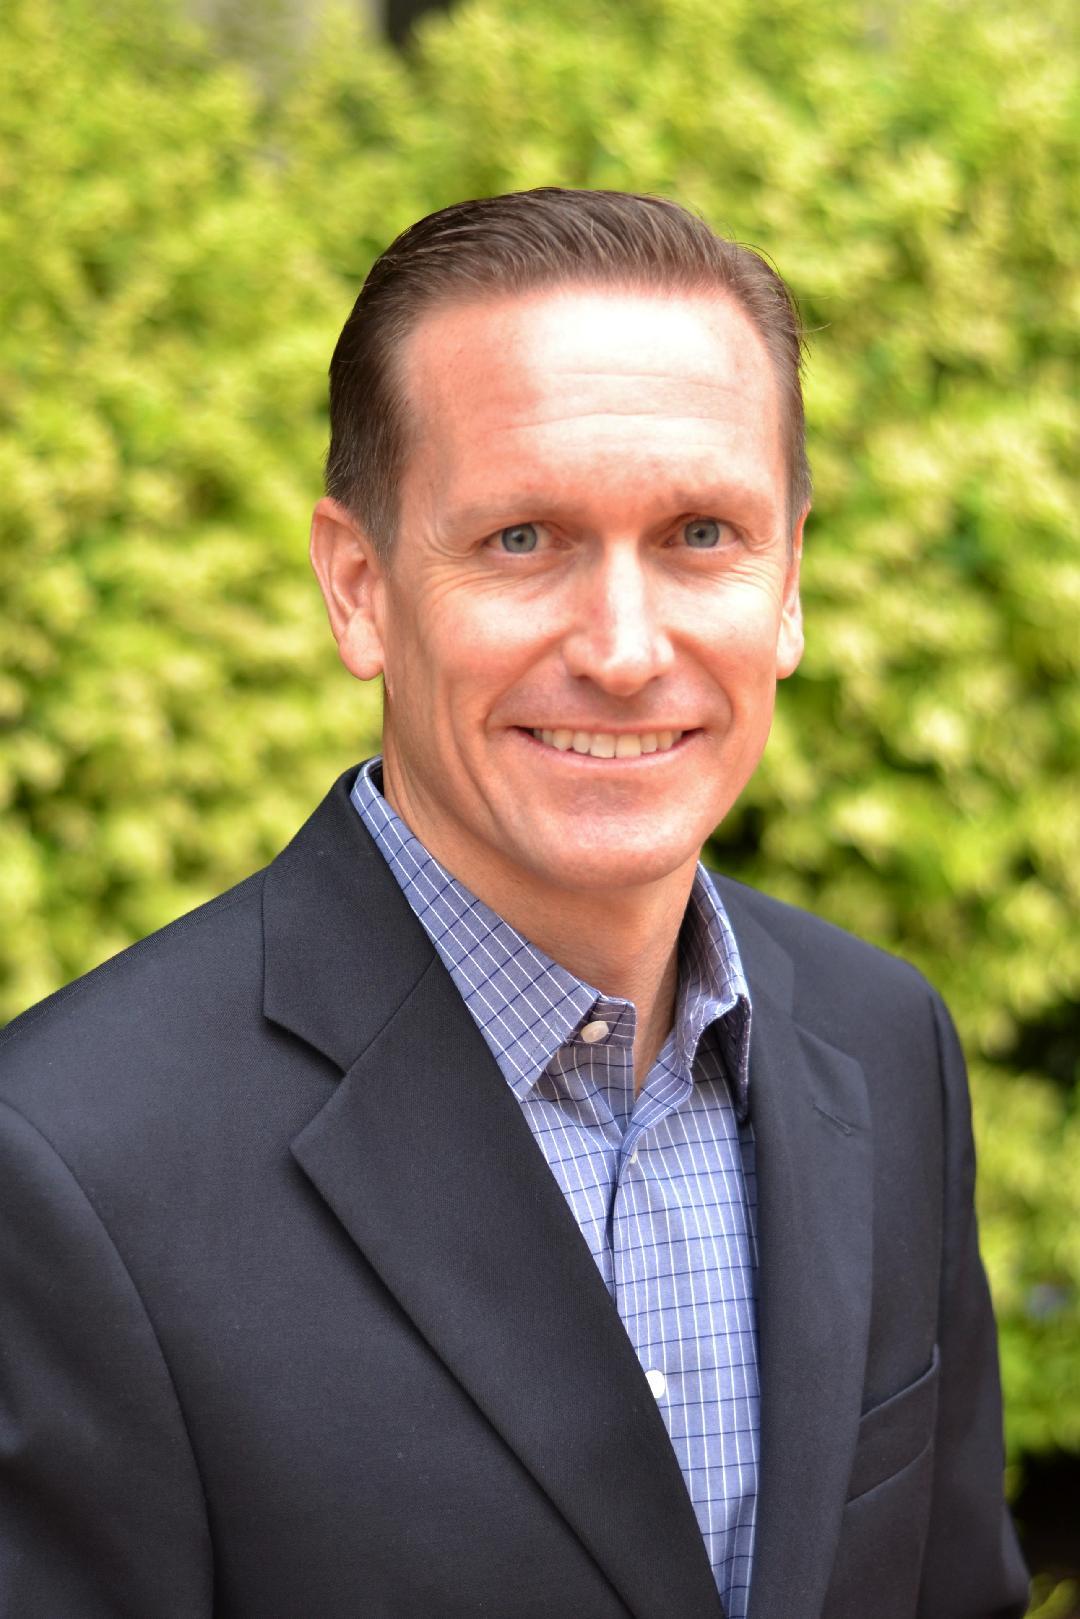 Michael Kronbetter